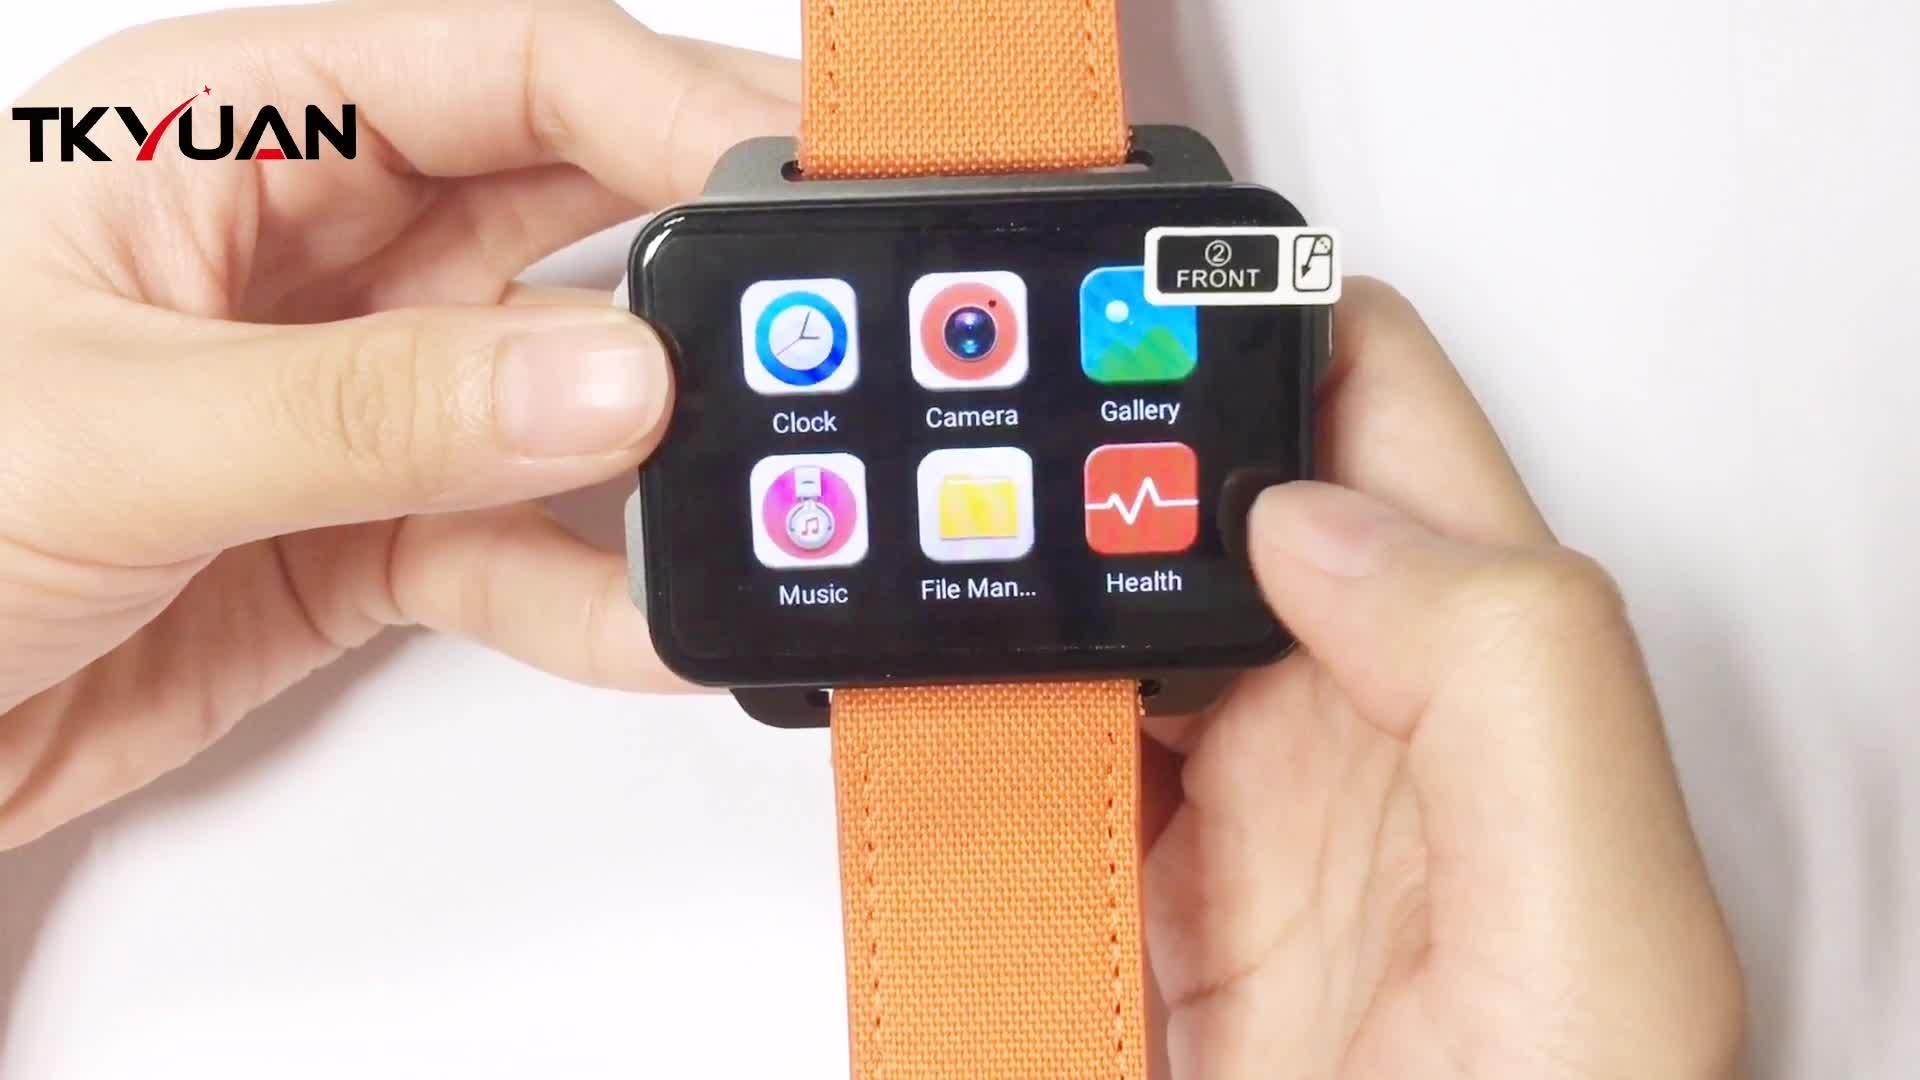 Android relógio 3g telefone, gps/wifi internet 3g cartão sim gps móvel do relógio telefone do relógio android com skype/telefone de chamada de vídeo relógio